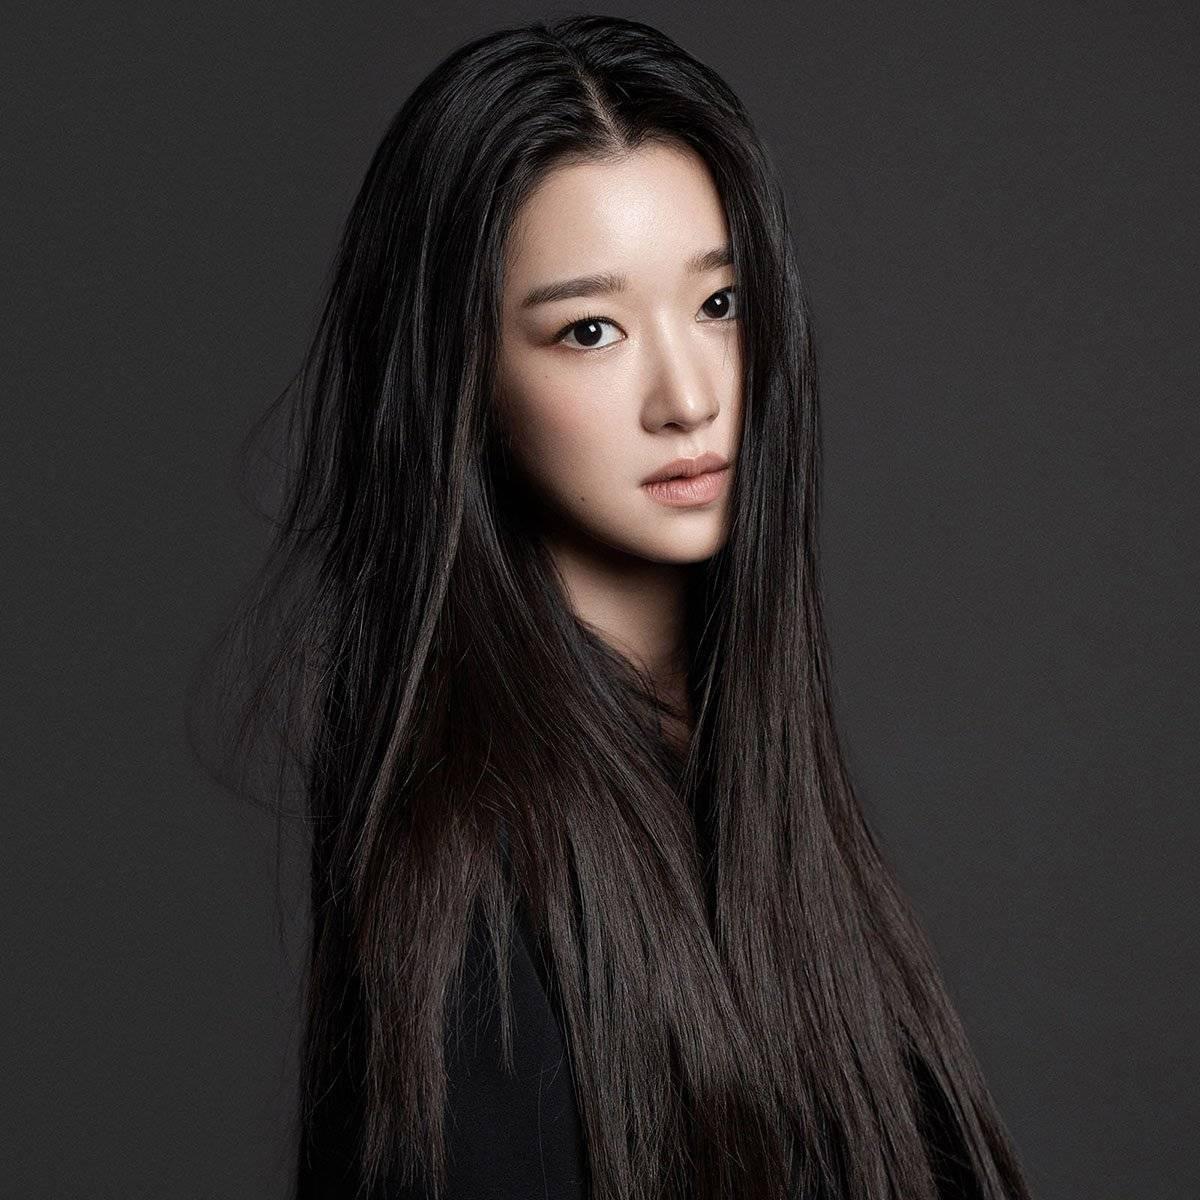 HanCinema's News] More New Accusations Pile up Against Seo Ye-ji @ HanCinema